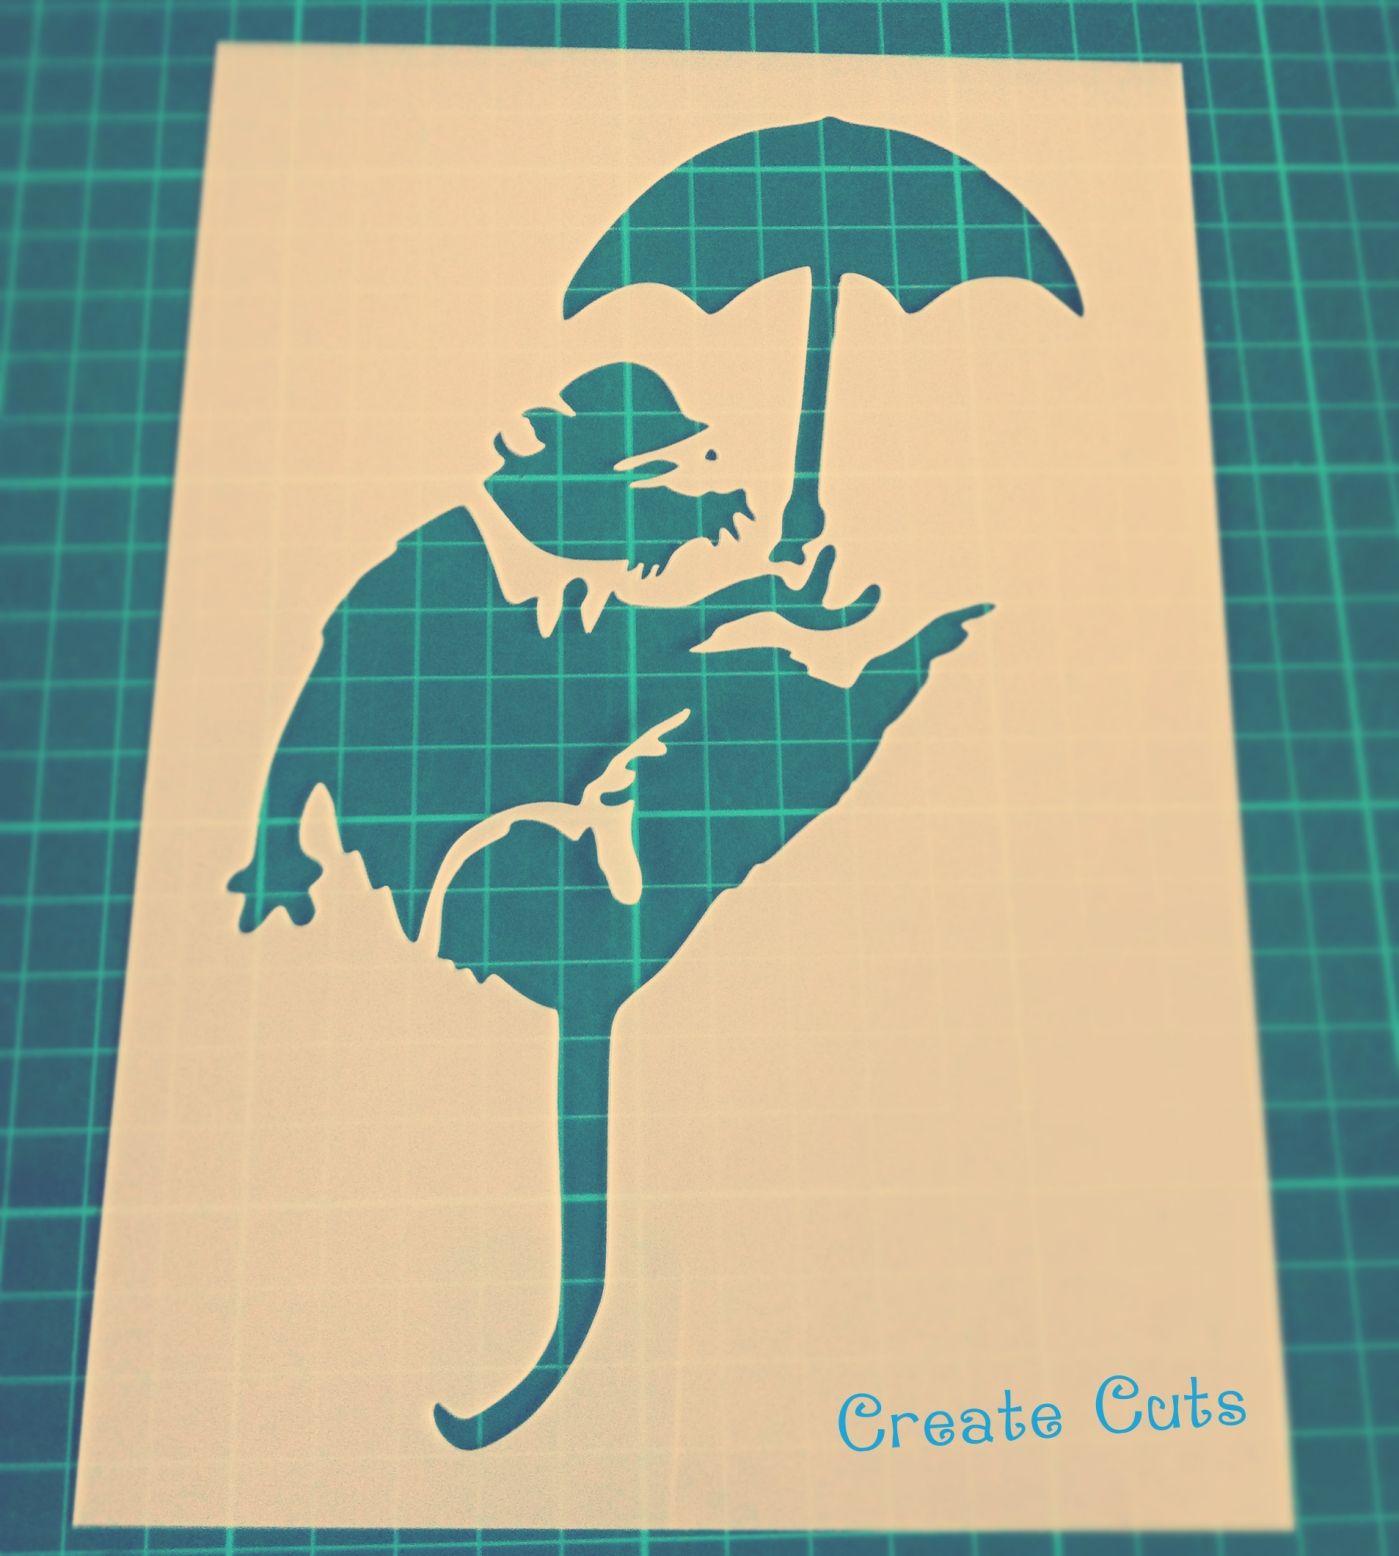 Pin by Christine Kenworthy on Stencils/Silk Screen | Pinterest ...